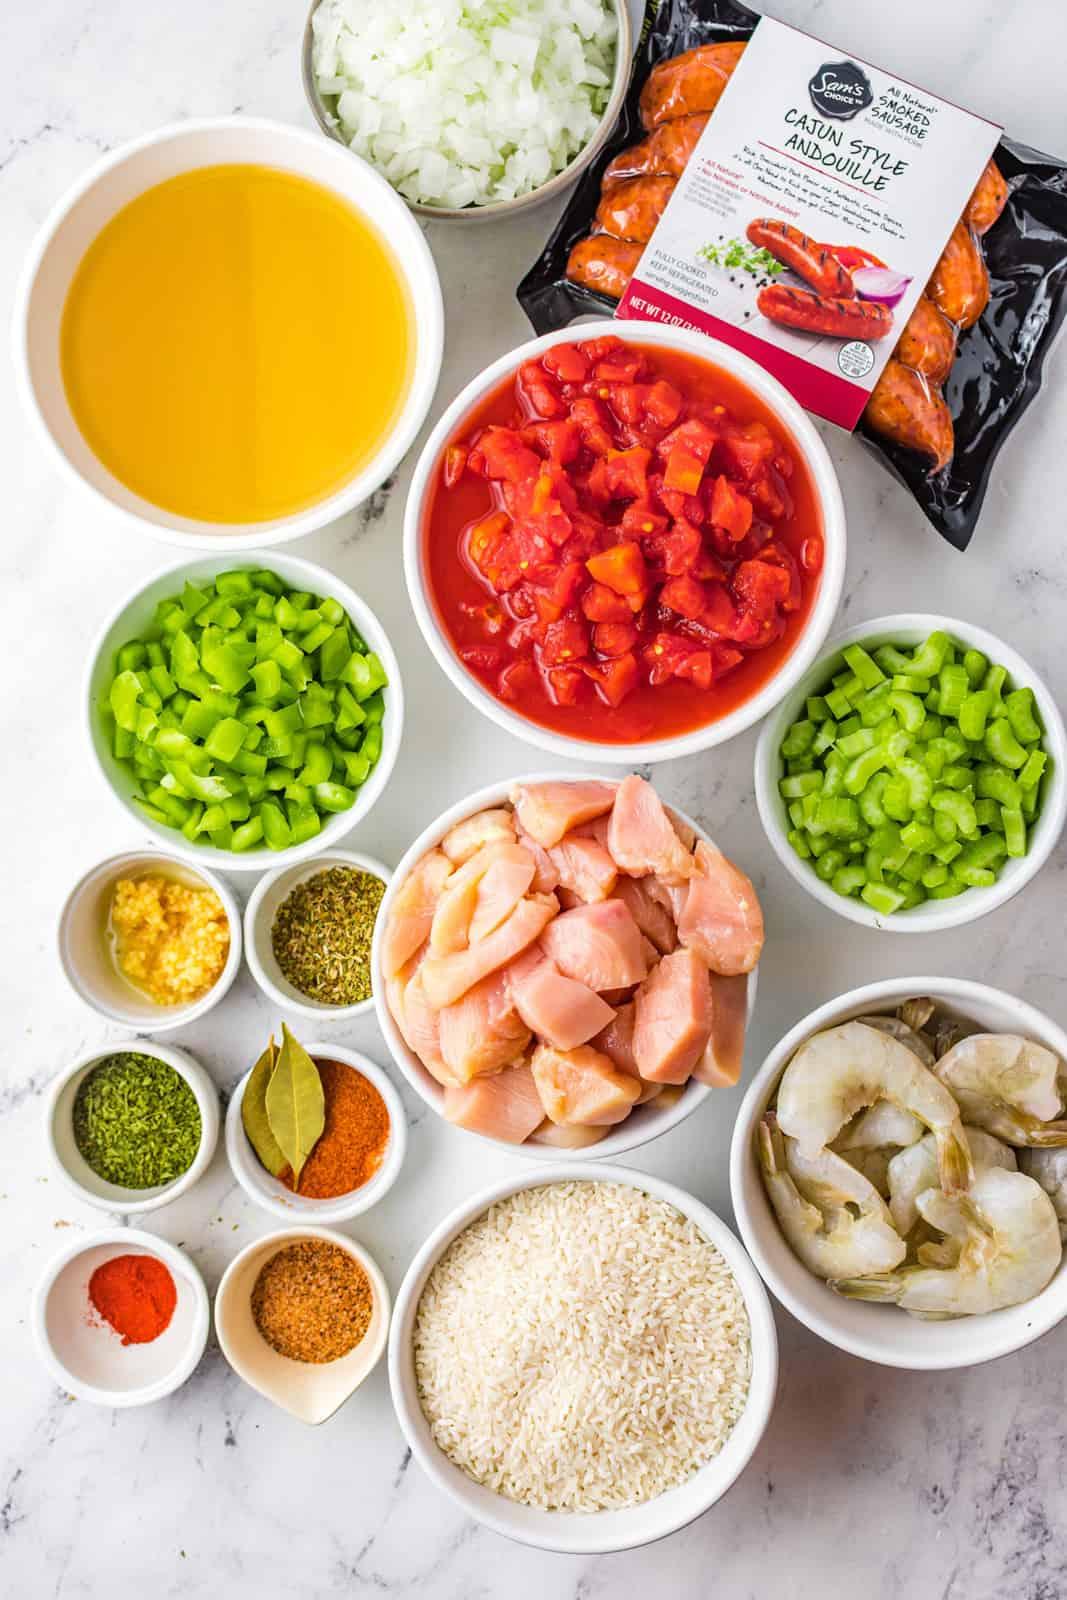 Ingredients needed to make Slow Cooker Jambalaya.